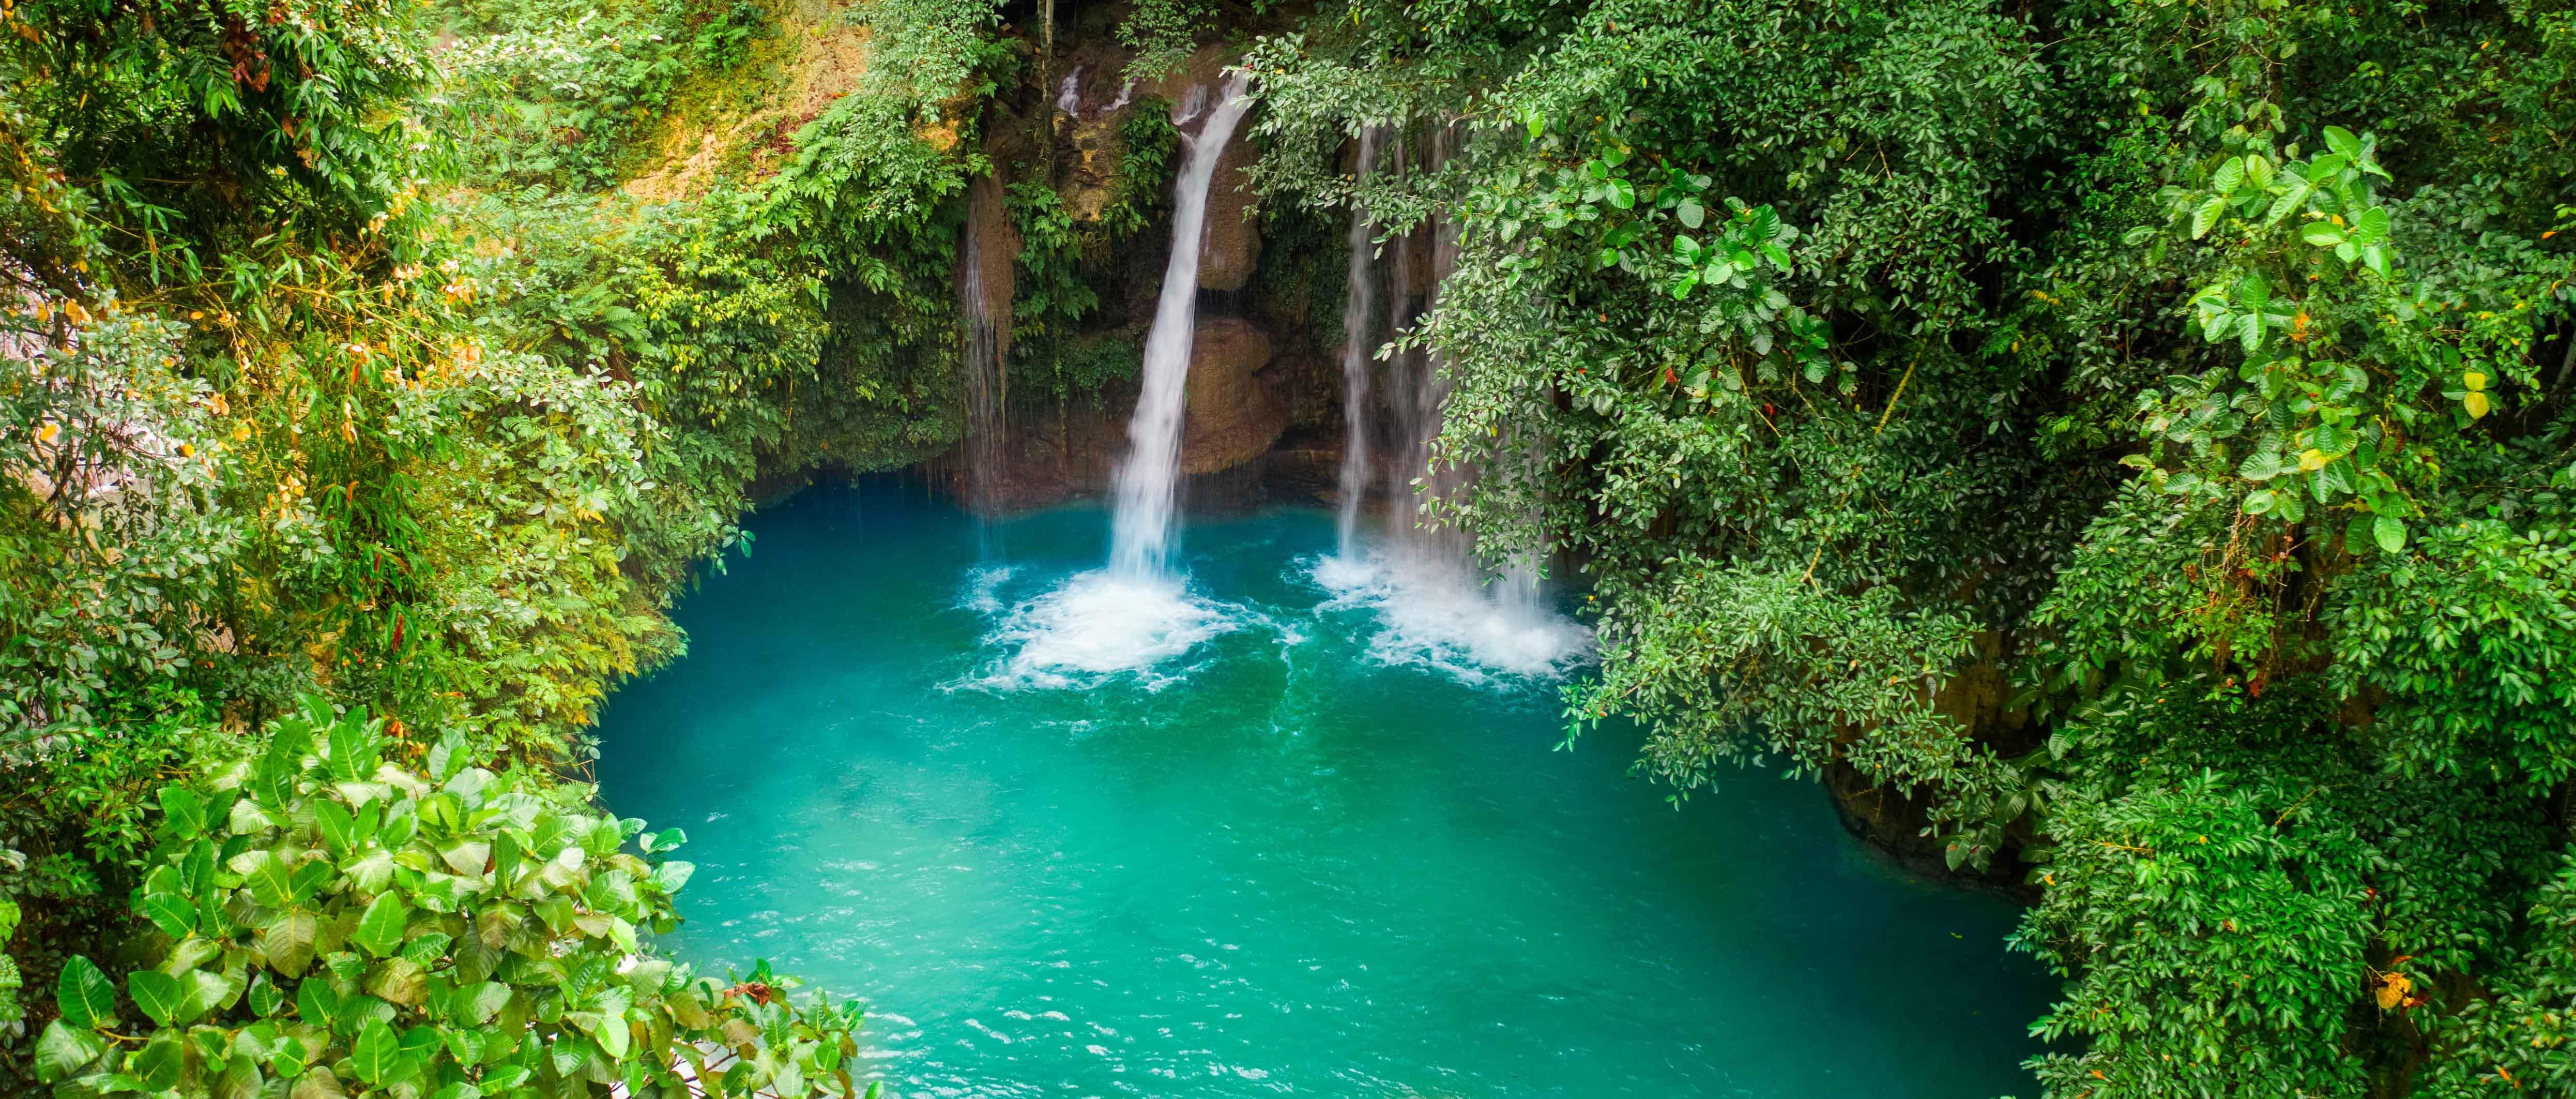 Cebu Badian Kawasan Falls Private Tour with Transfers from Cebu City or Mactan